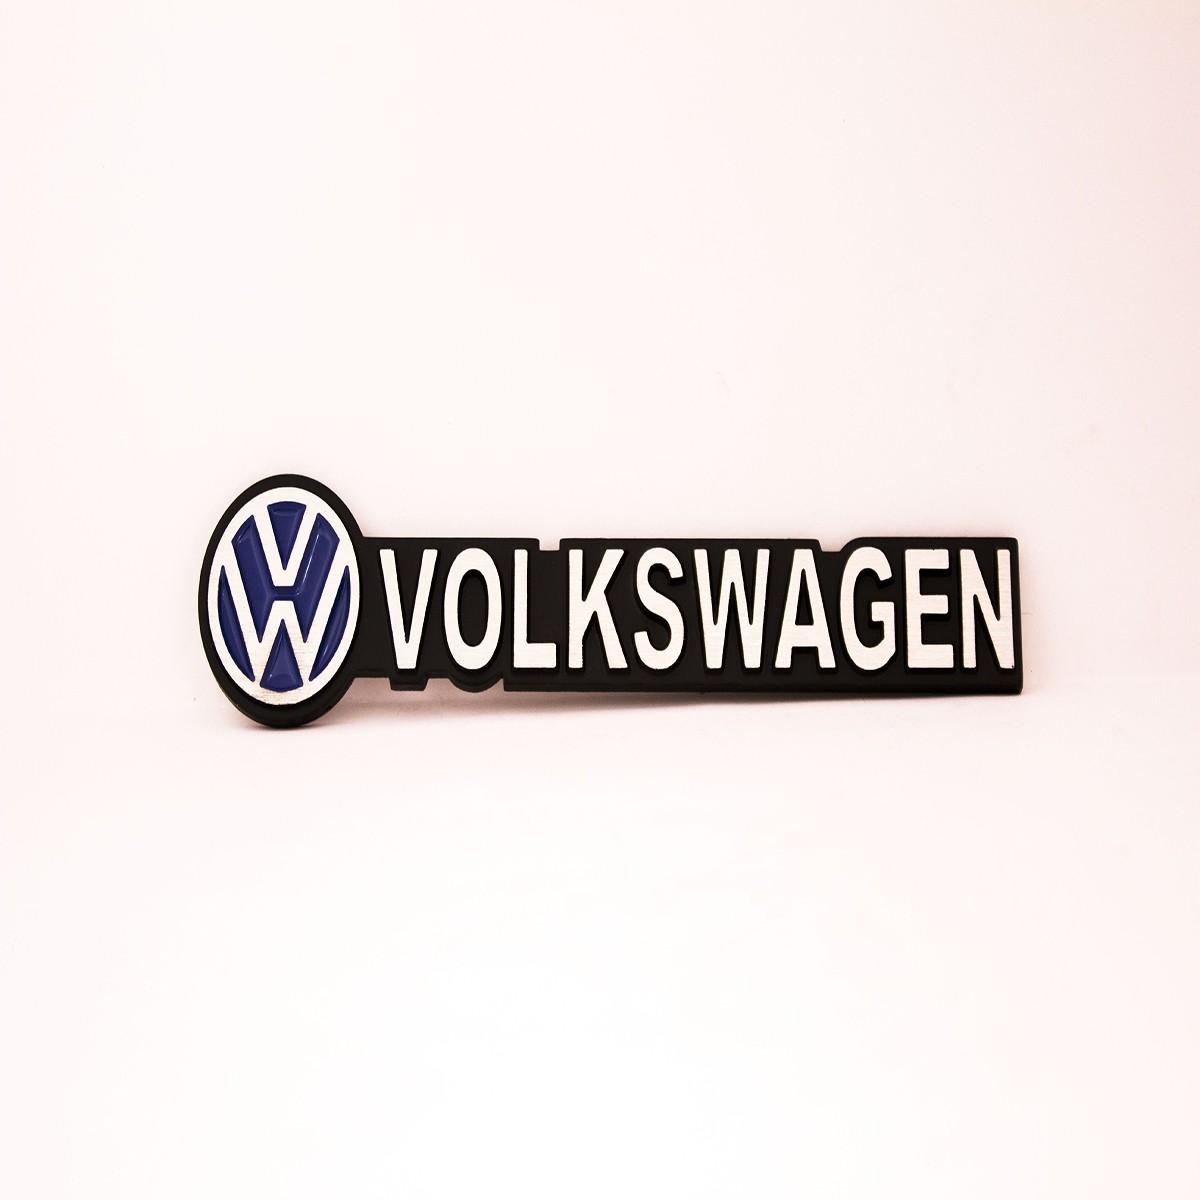 Volkswagen Metal Logo Batch for Cars